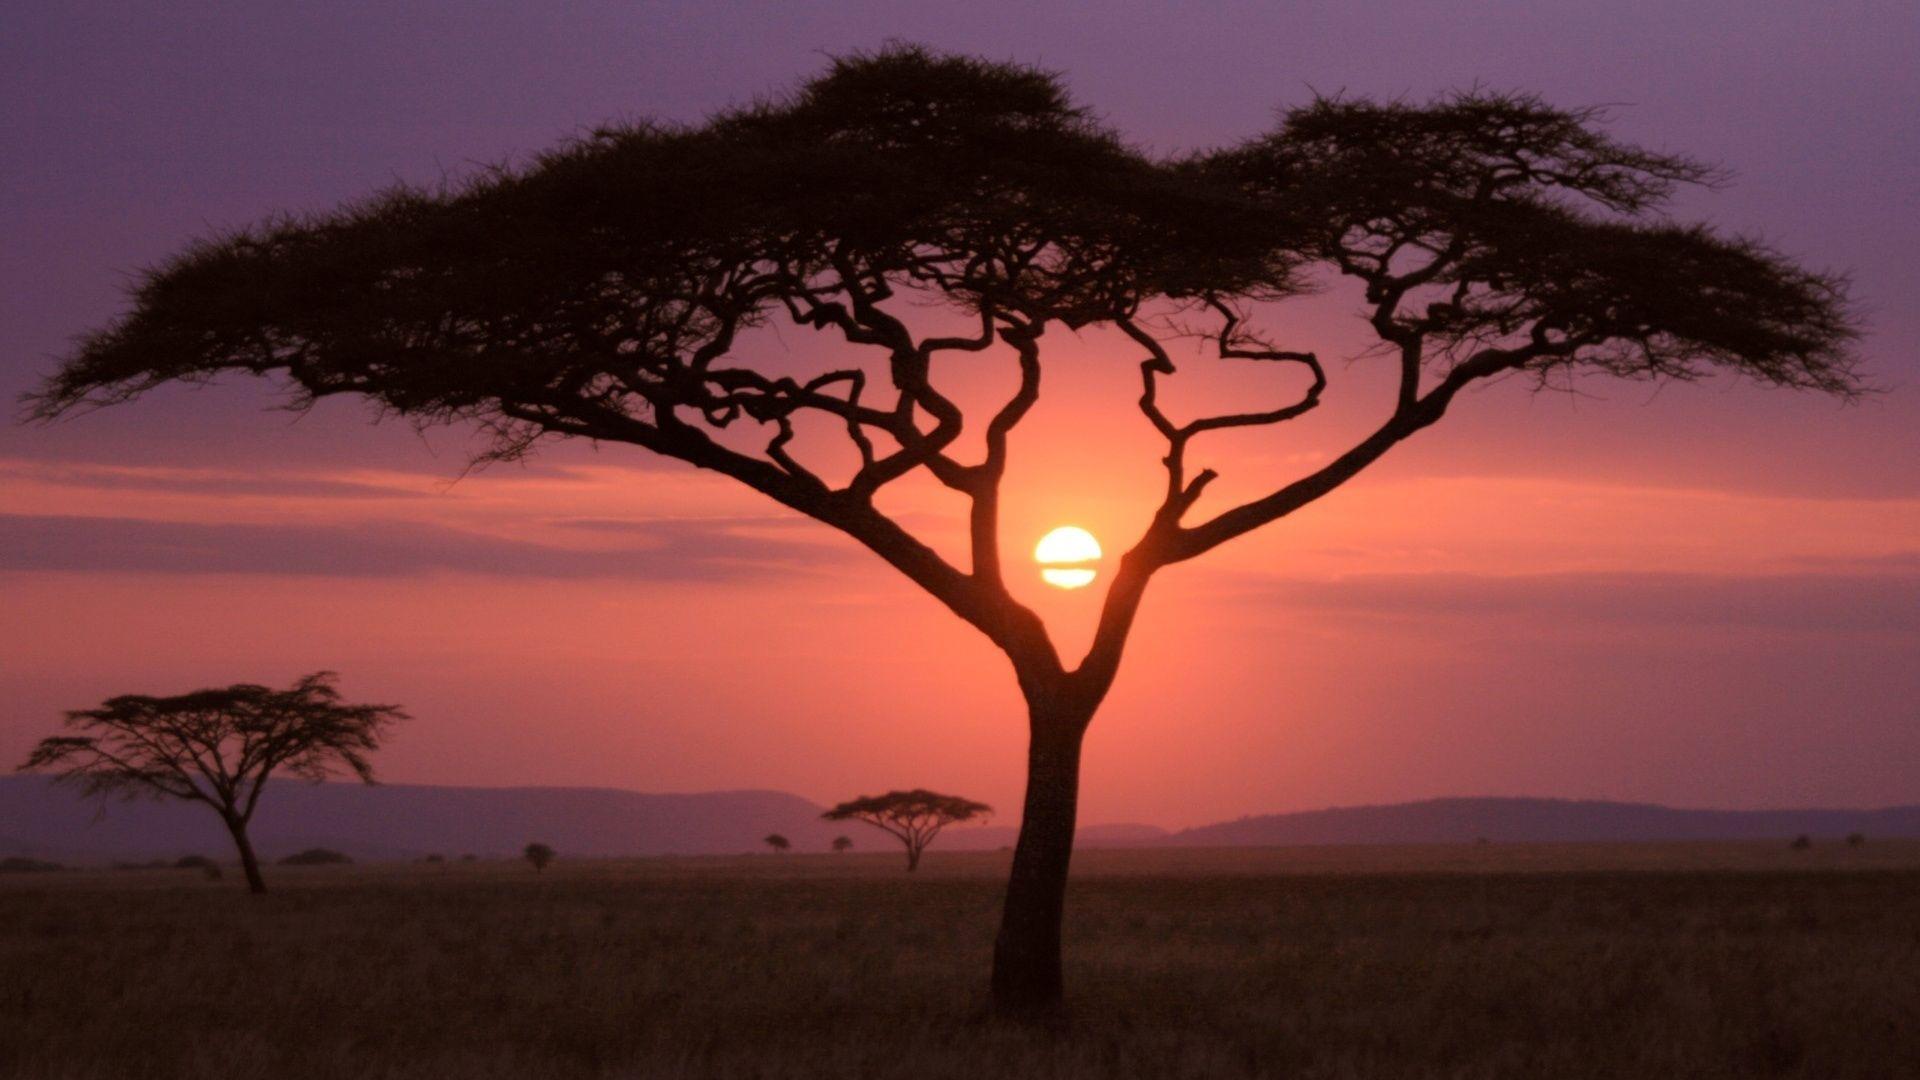 The Savannah Of Africa Hd Photo